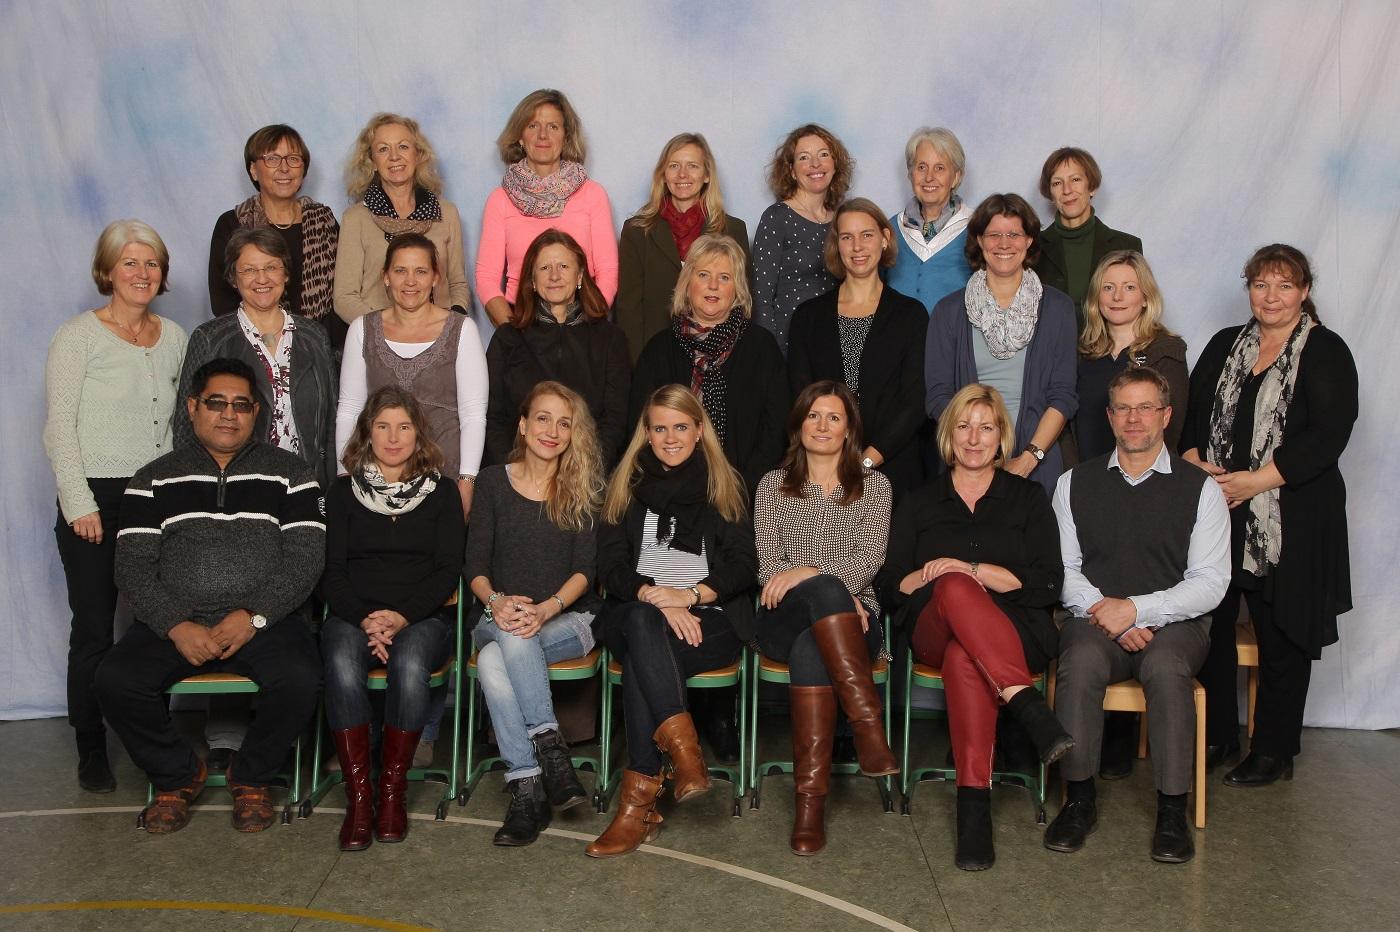 Kollegium der Grundschule Buckhorn im Dezember 2015